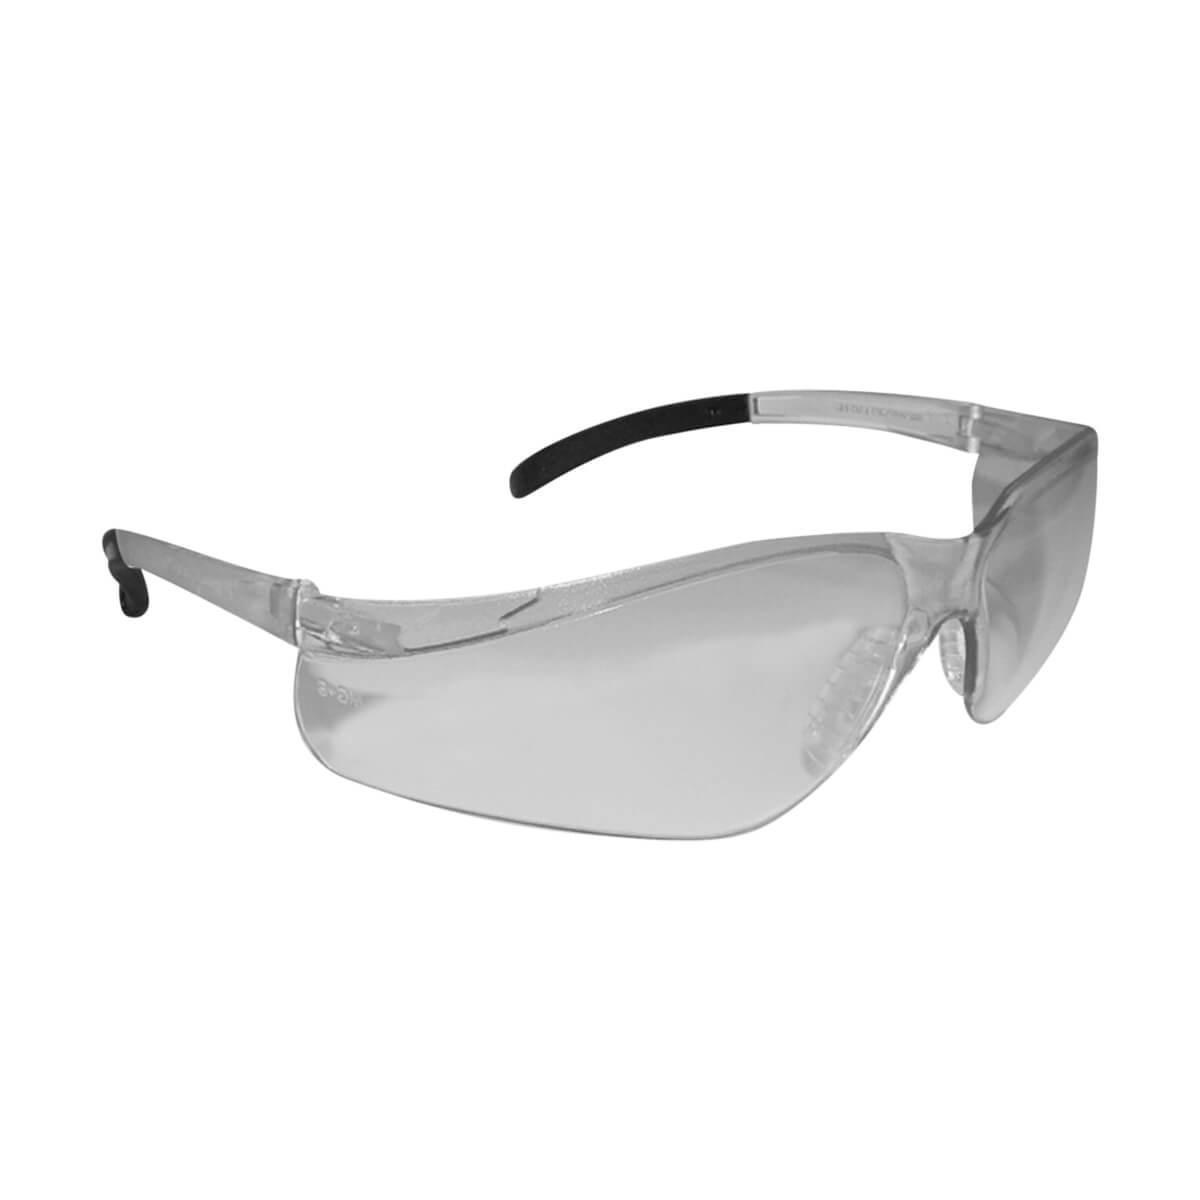 Phantom Protective Eyewear - Clear Lens